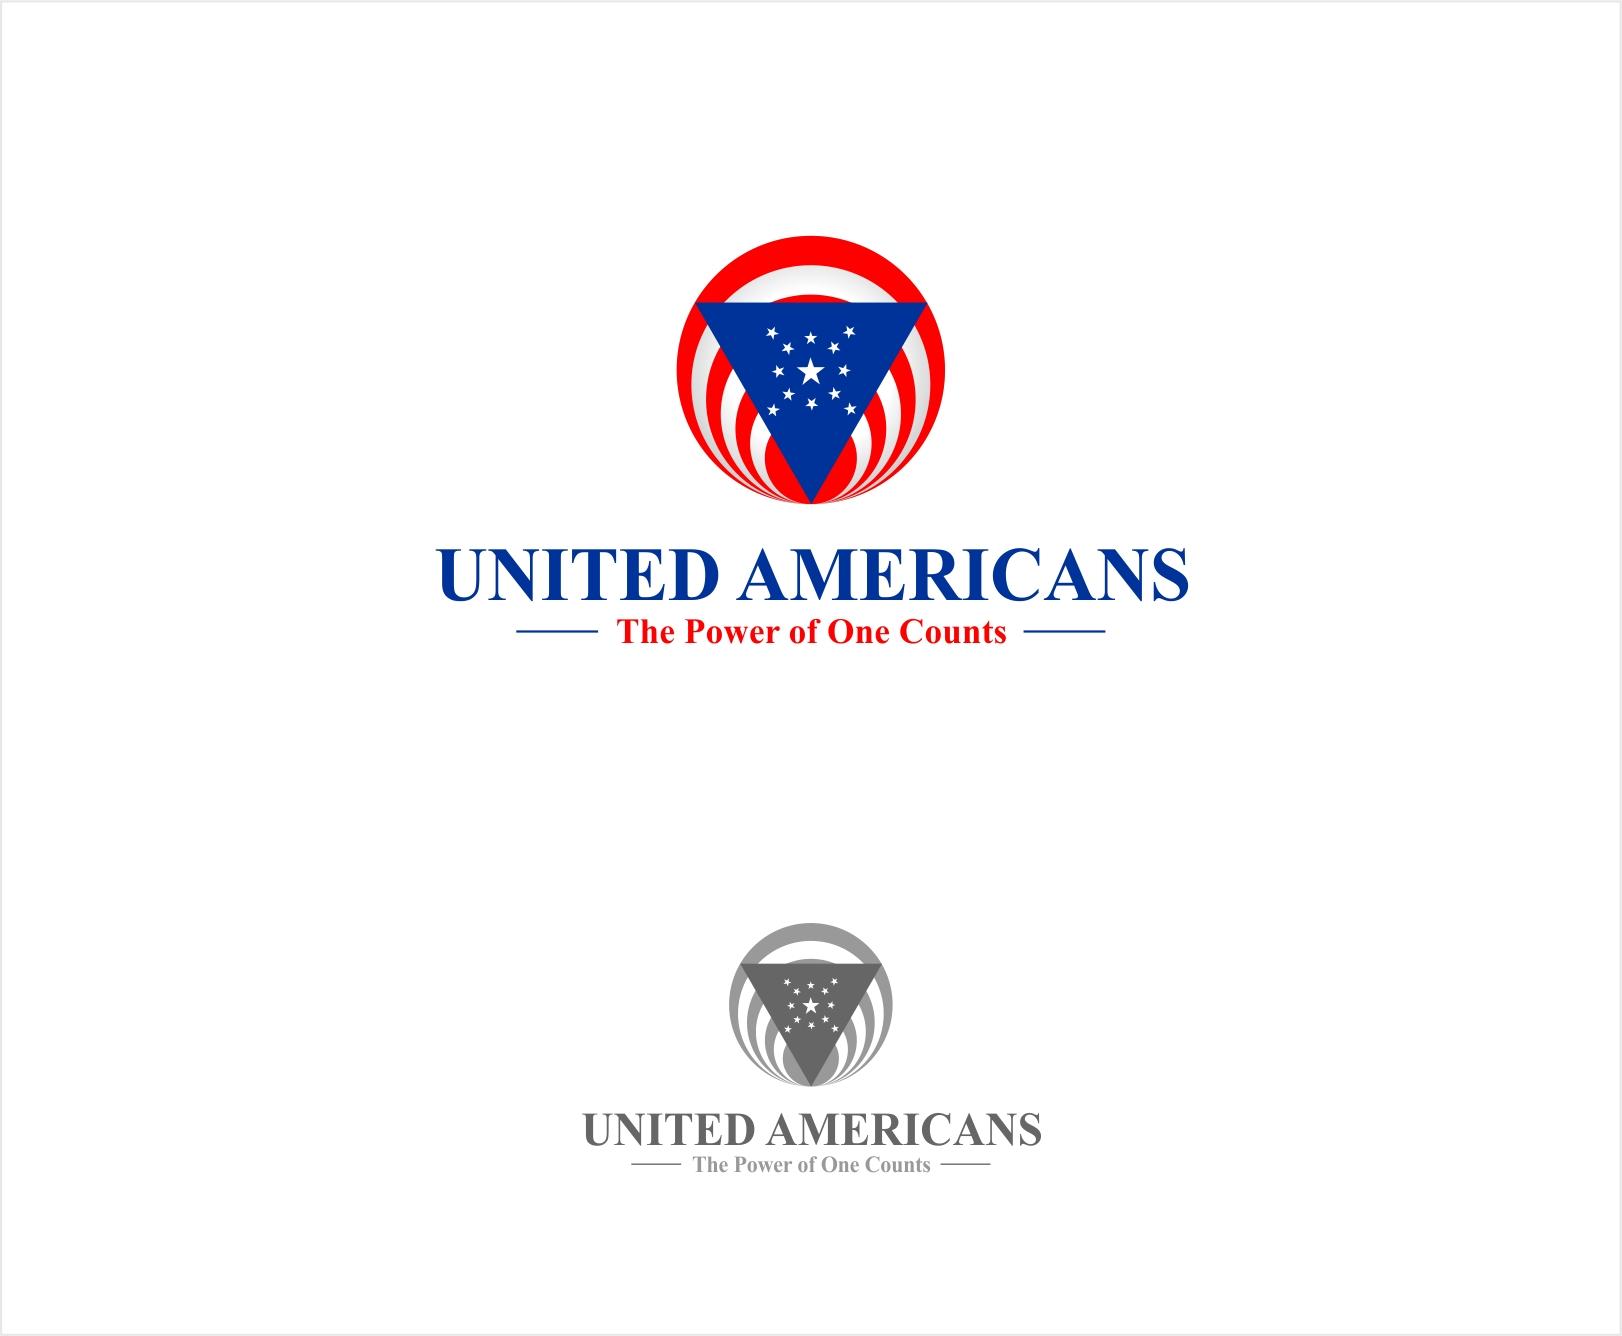 Logo Design by haidu - Entry No. 52 in the Logo Design Contest Creative Logo Design for United Americans.